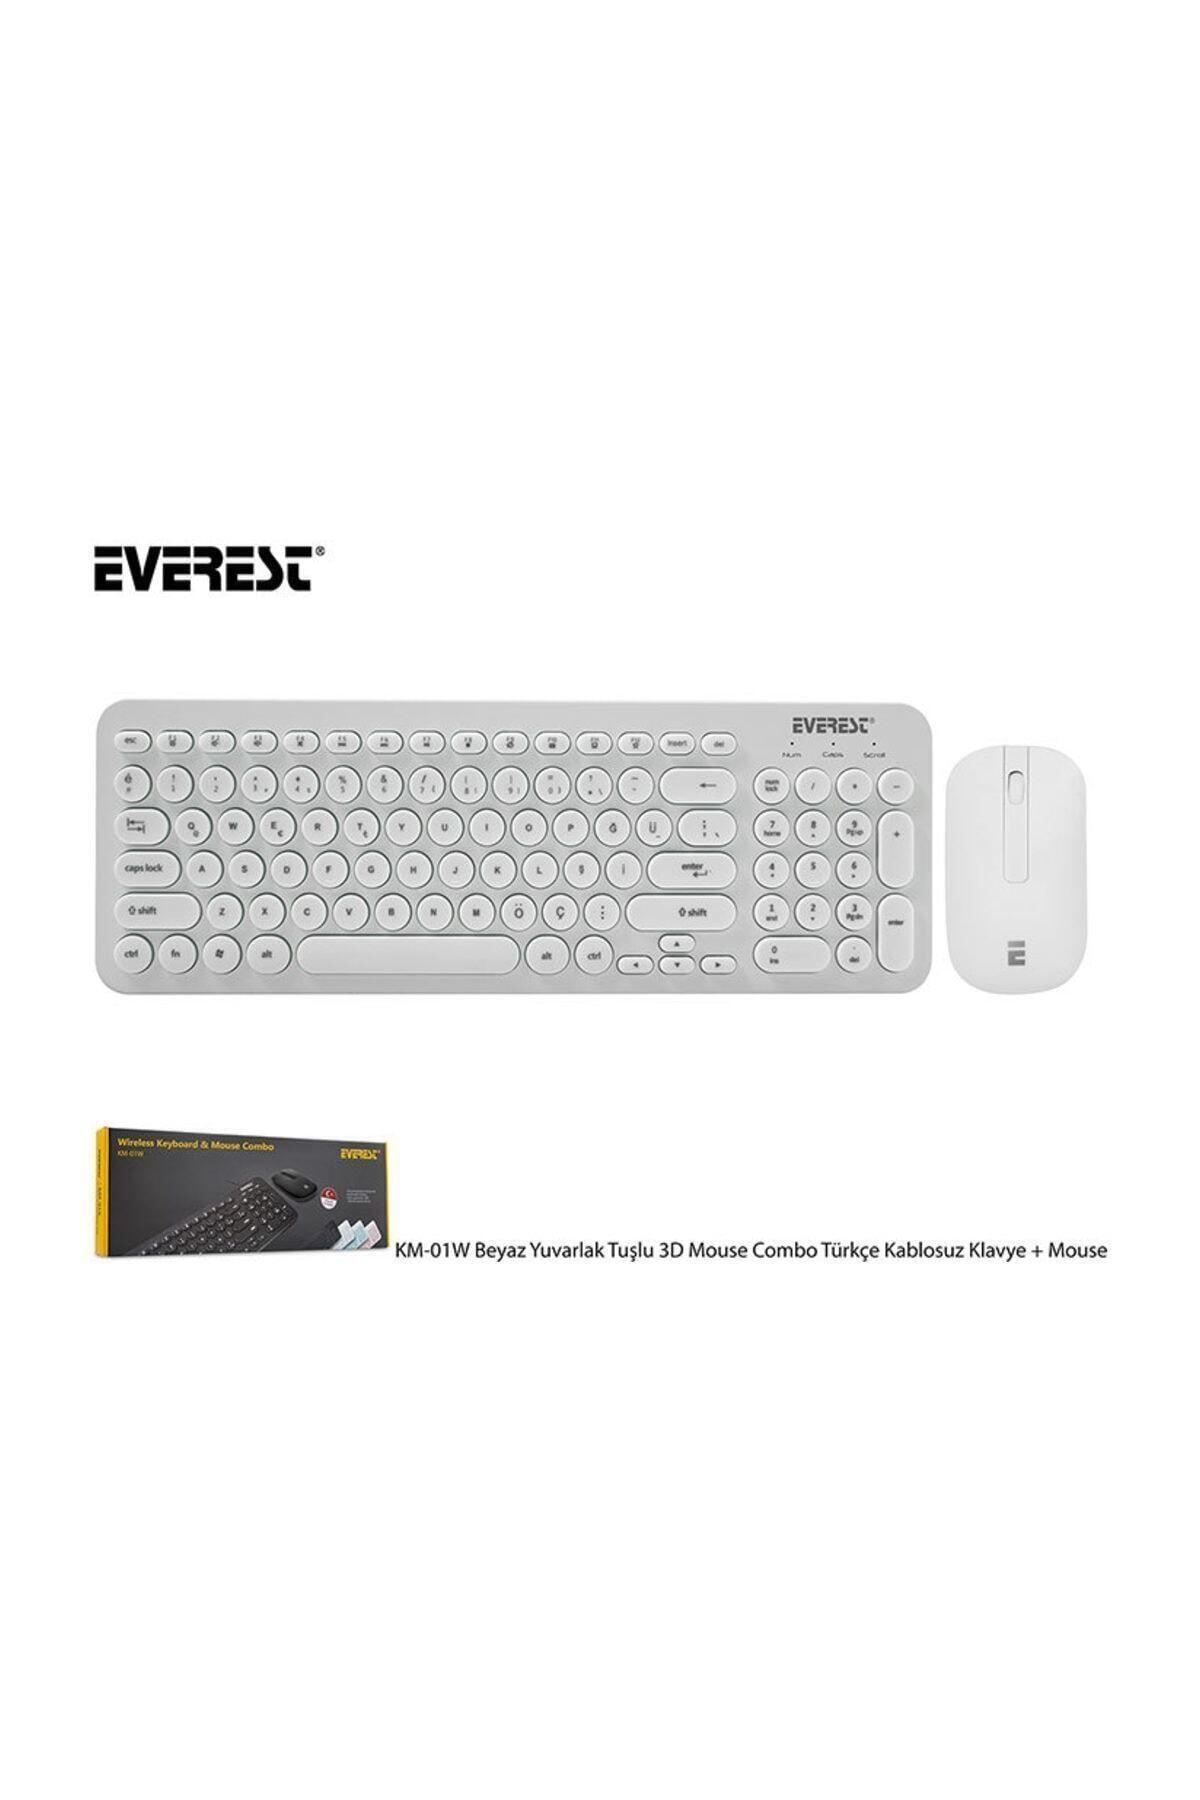 Everest Km-01w Beyaz Yuvarlak Tuşlu 3d Mouse Combo Türkçe Kablosuz Klavye + Mouse 1